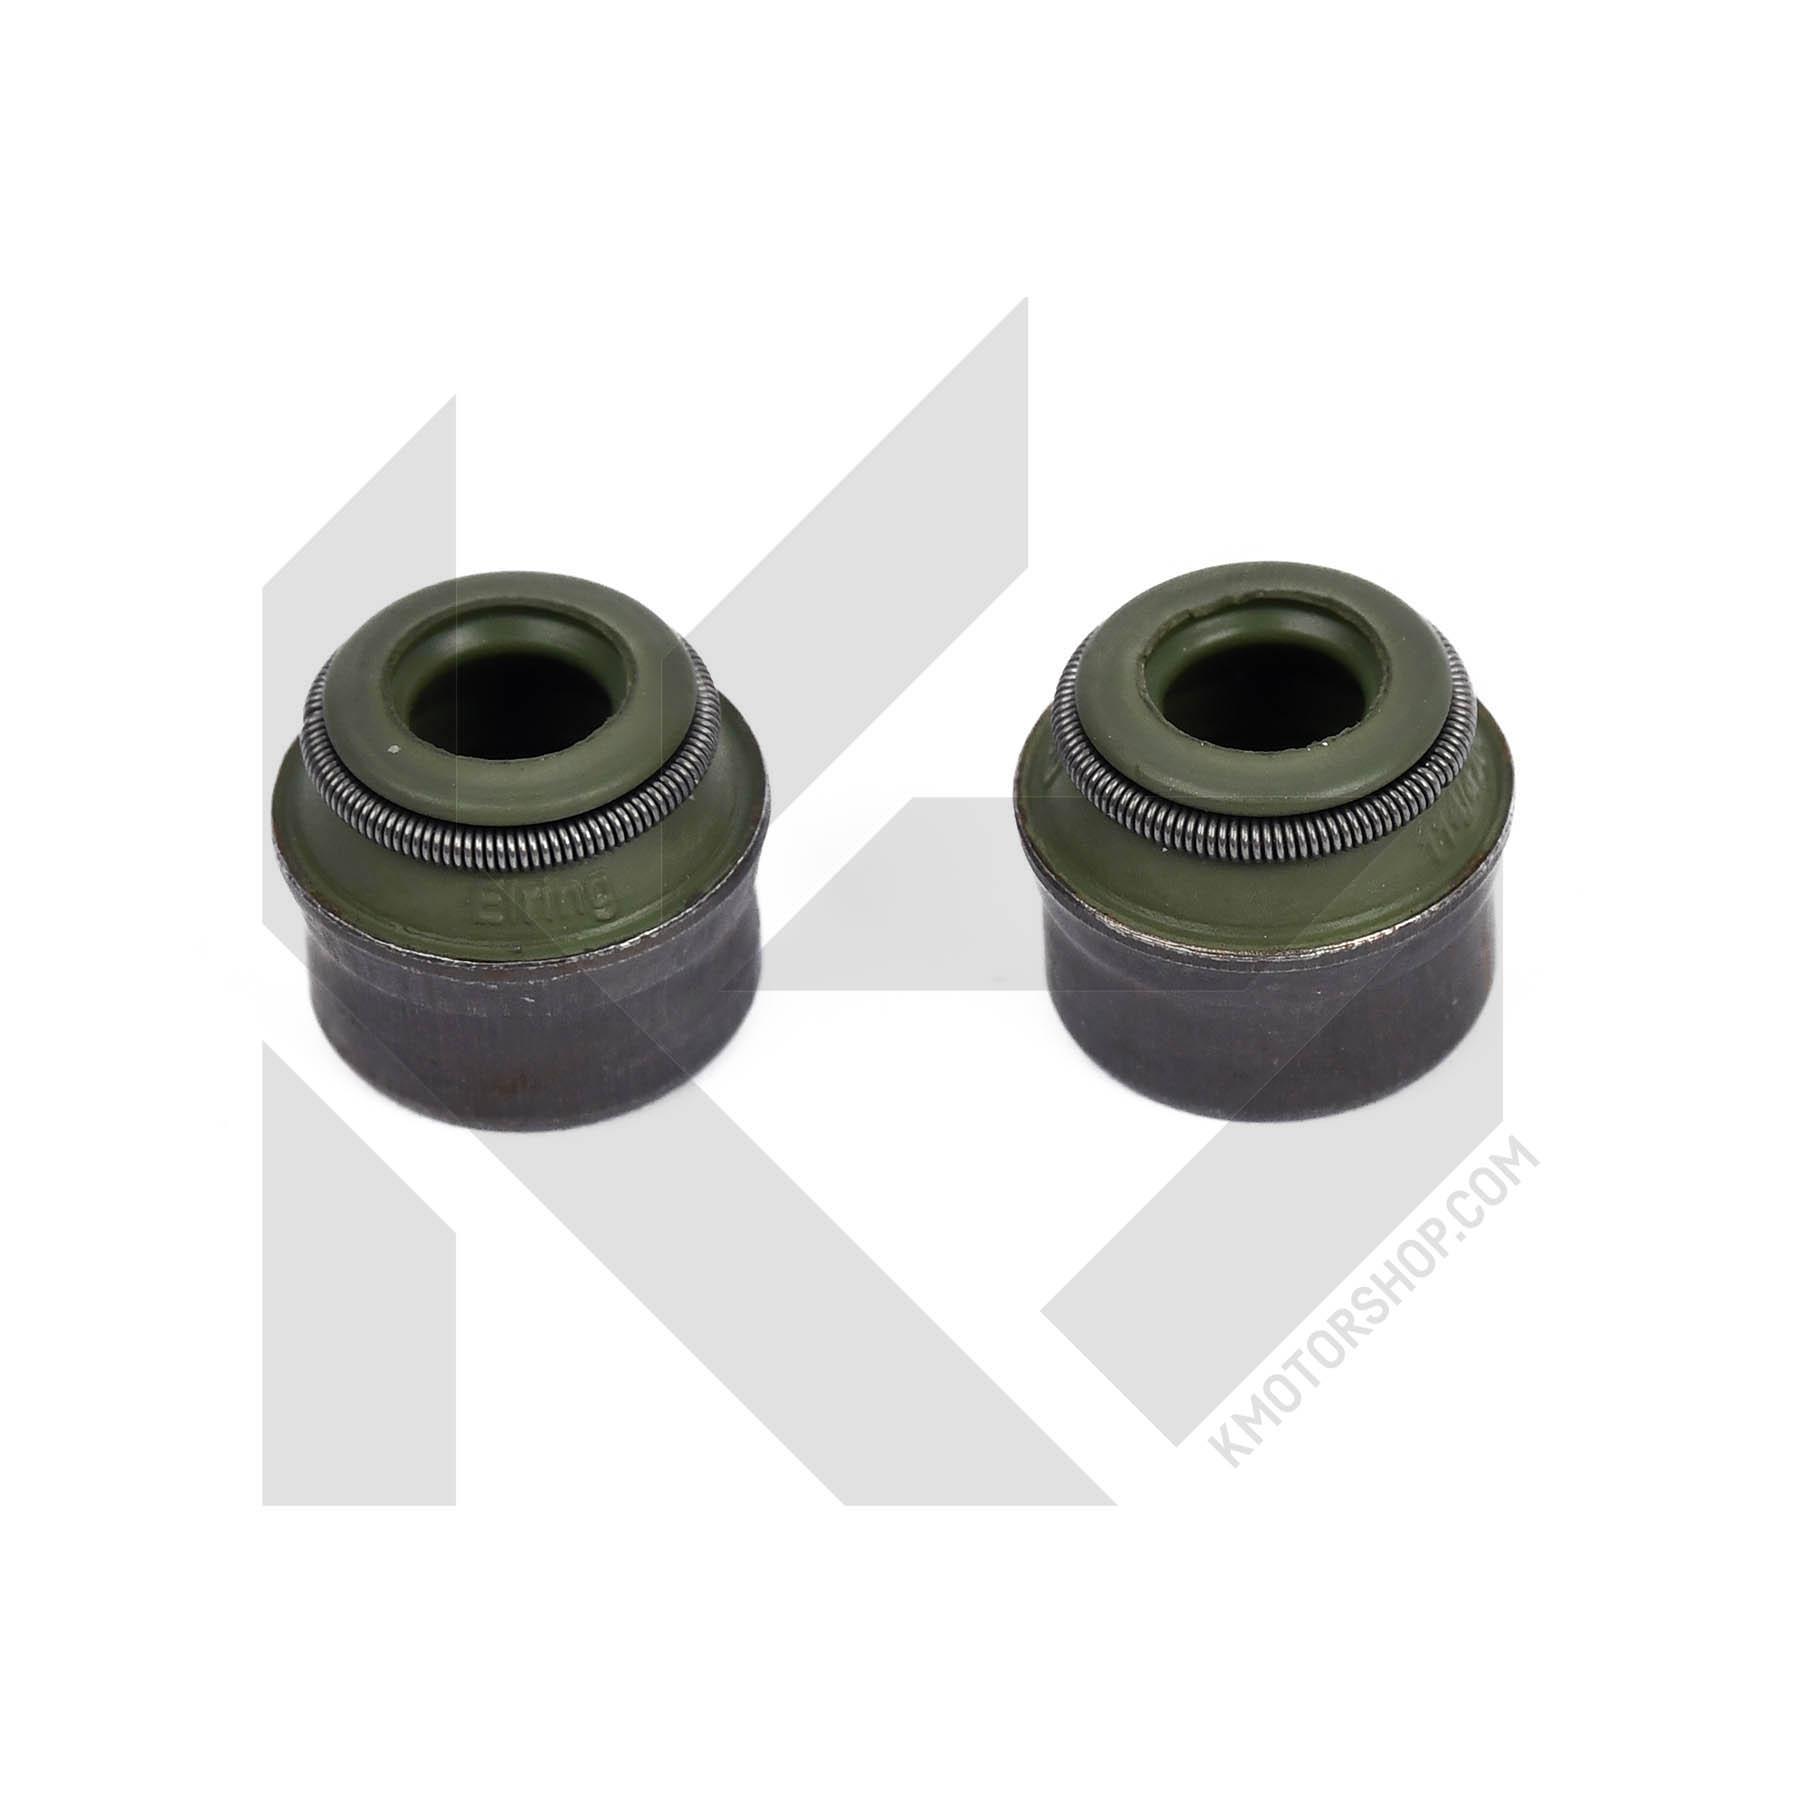 x2 Exhaust Manifold Gasket Seal FOR TALBOT EXPRESS 1.9 87-/>90 Diesel Van Elring